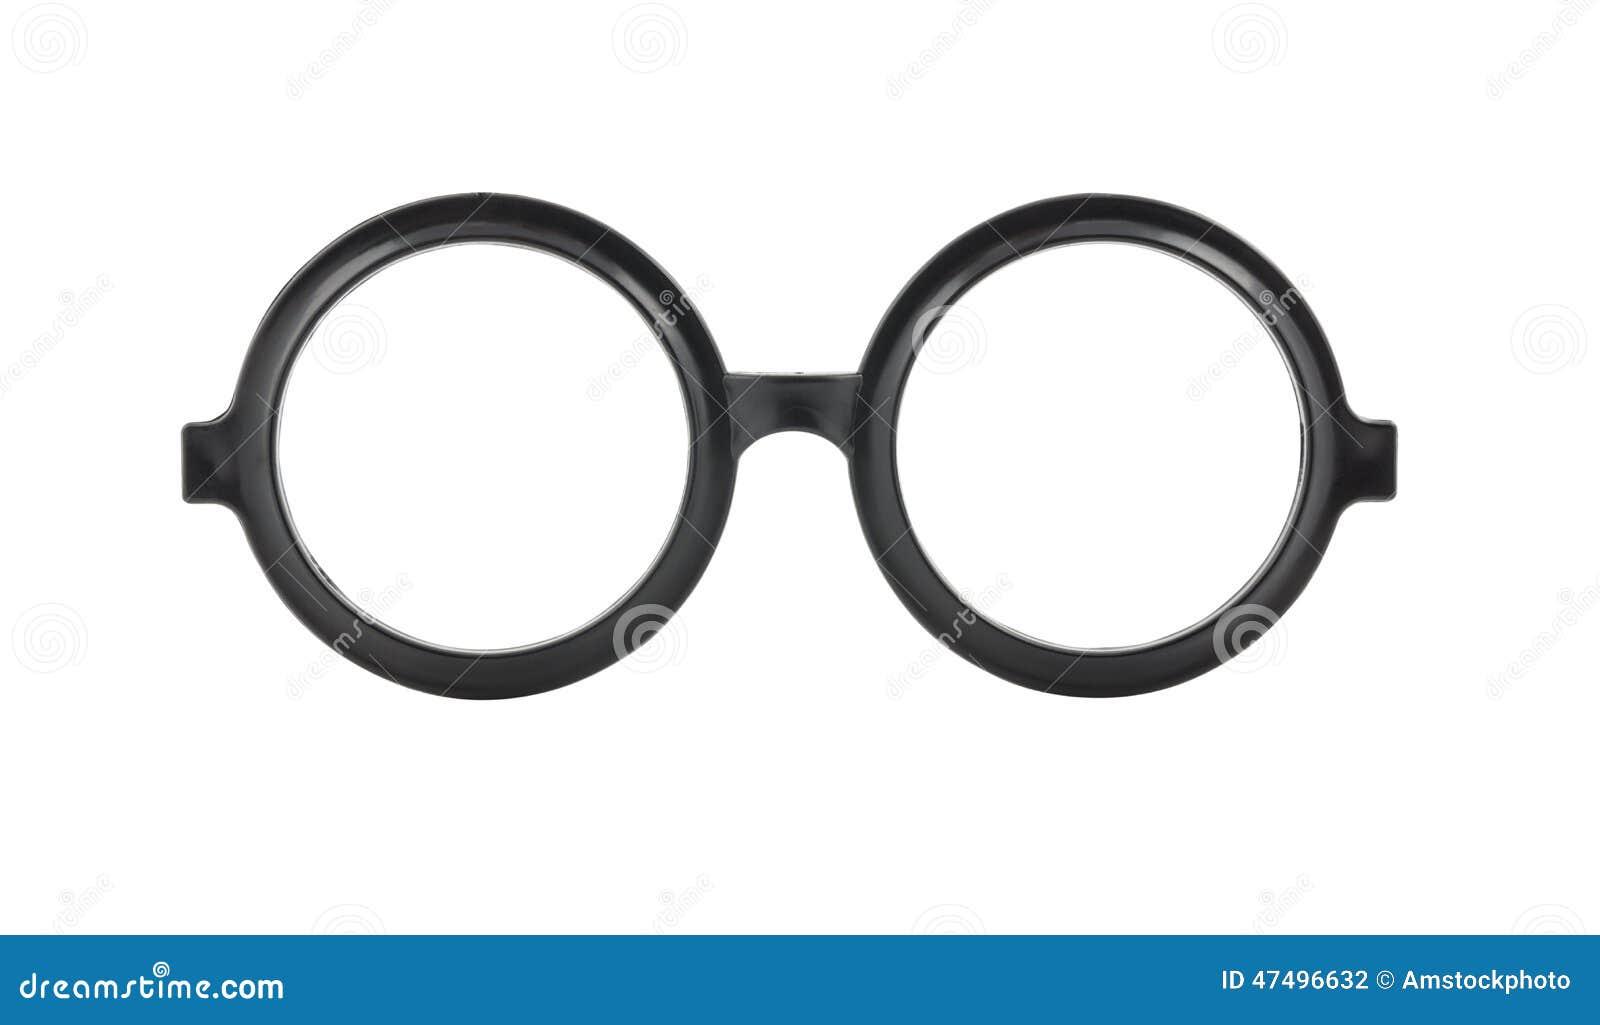 Round Glasses Frame Black : Round Frame Glasses Isolated On White Background Stock ...